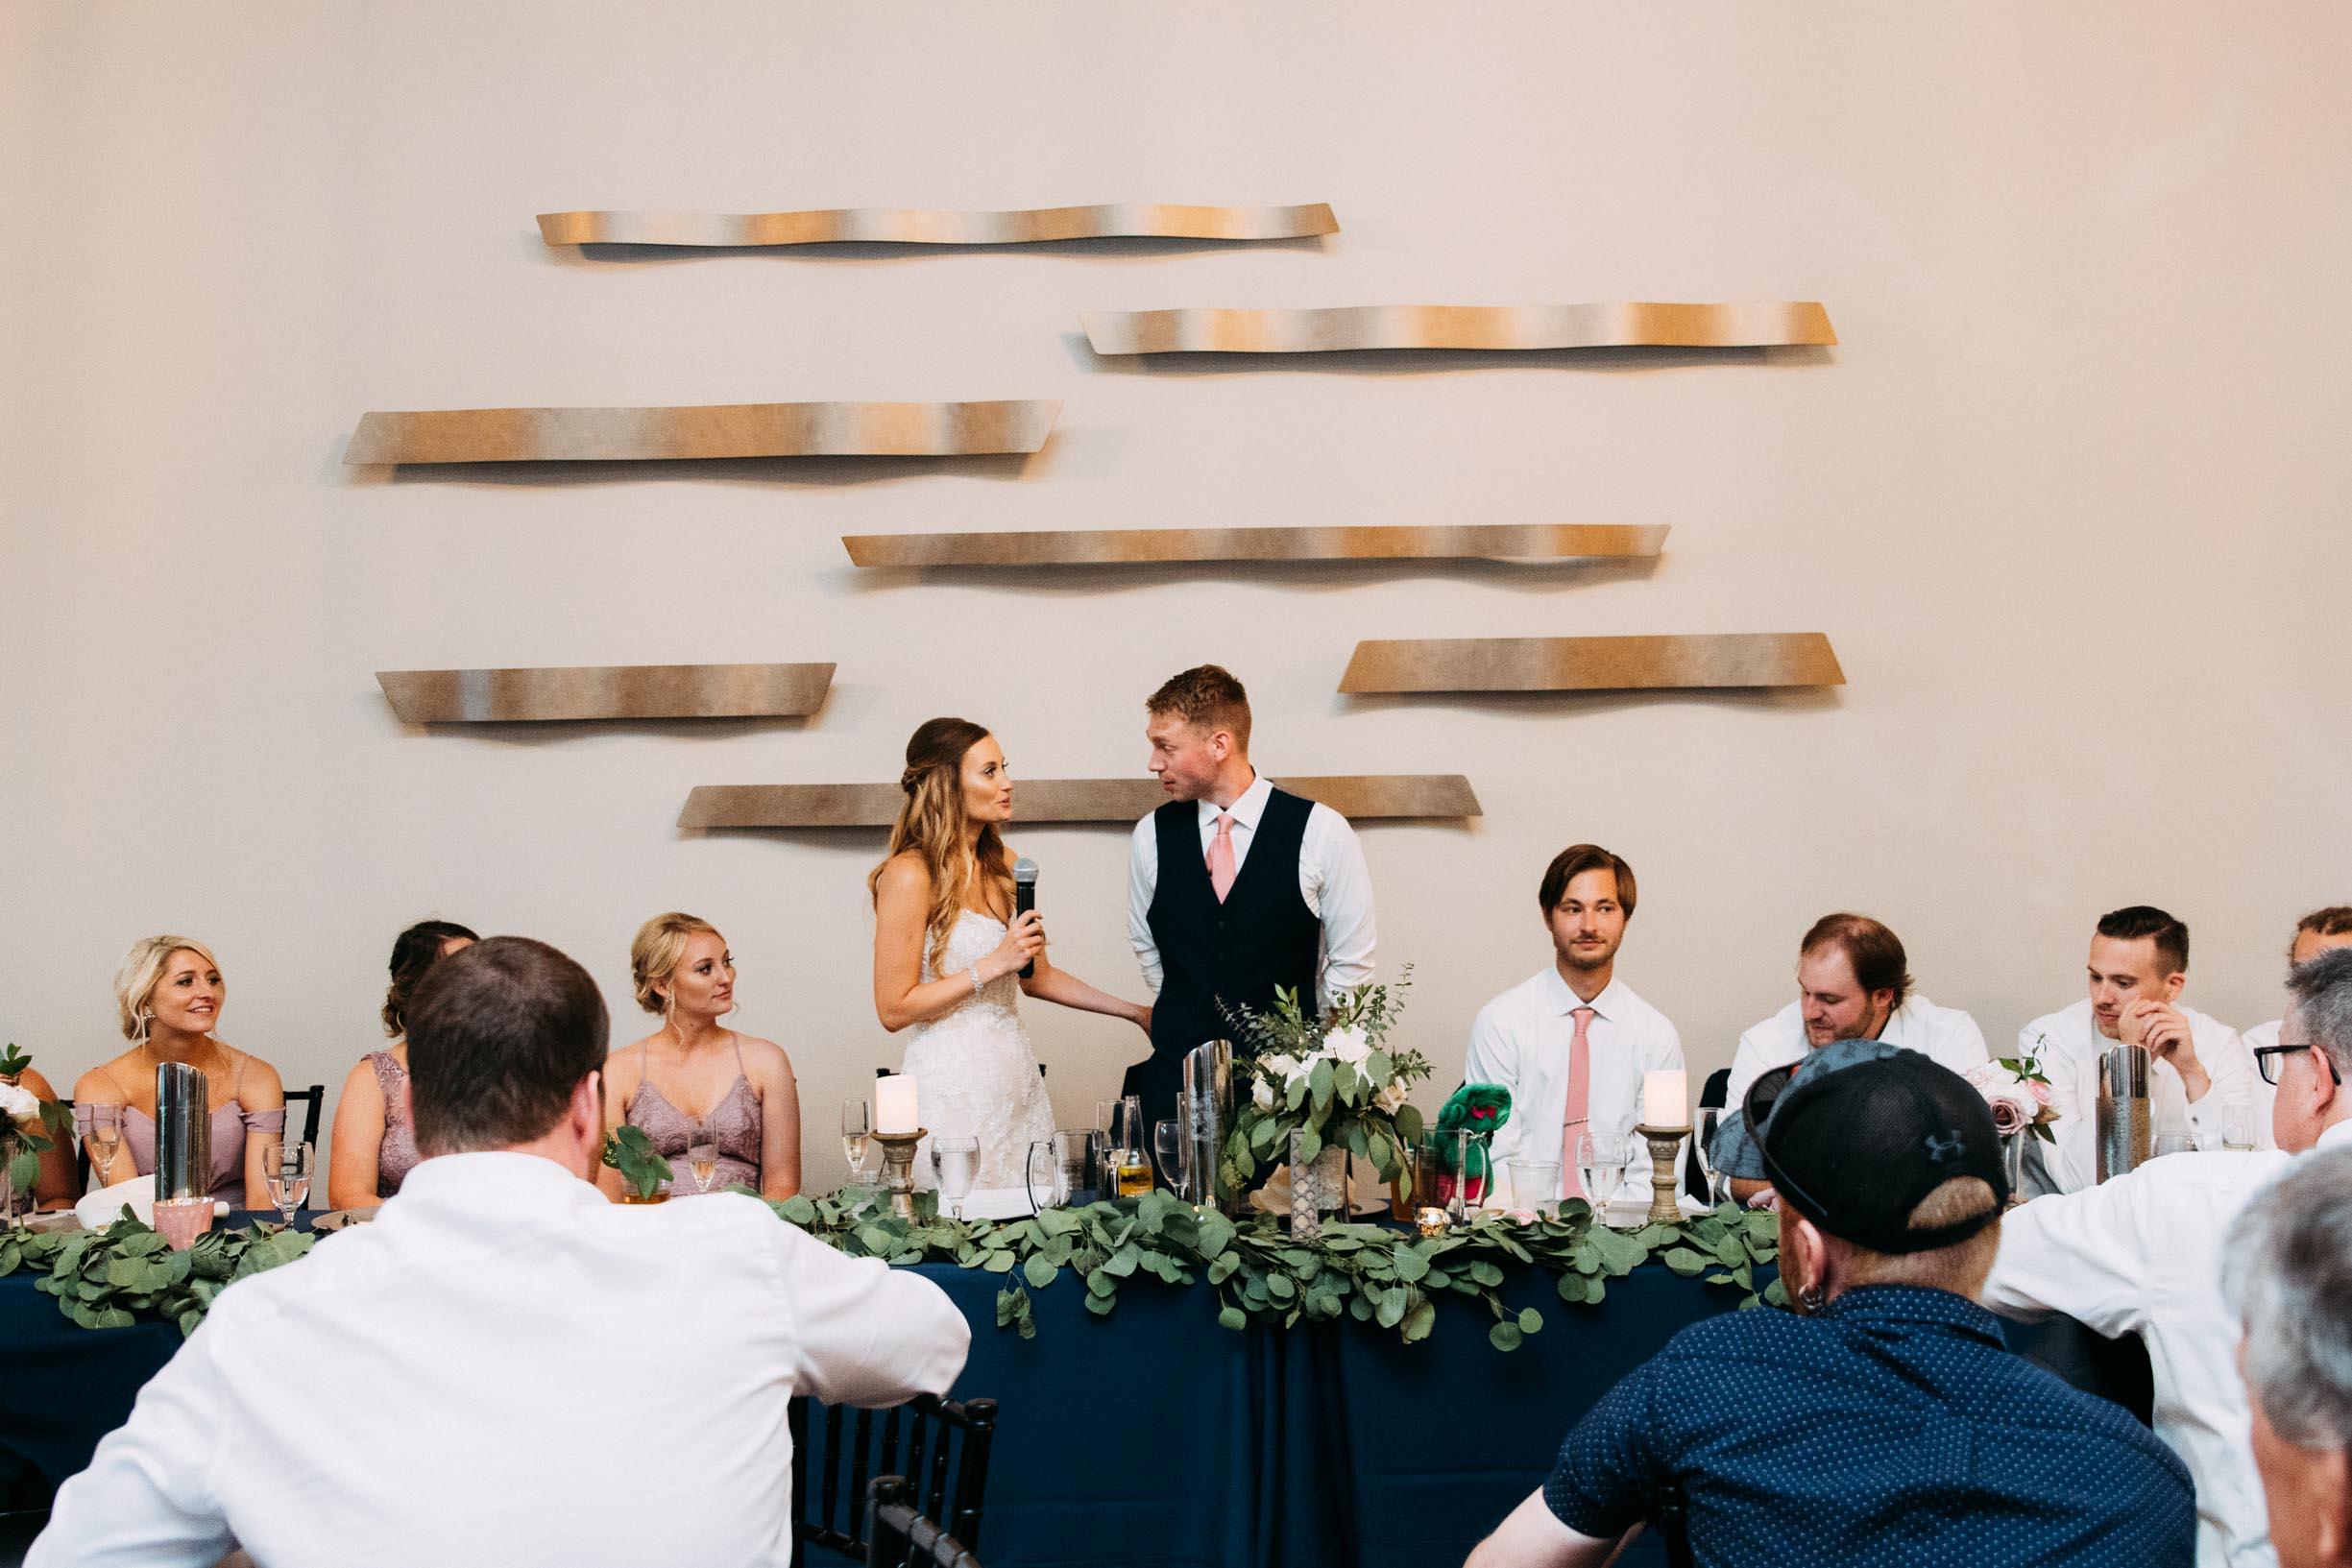 70-WeddingsattheBroz_Minnesota_WeddingBlog_Reception.jpg